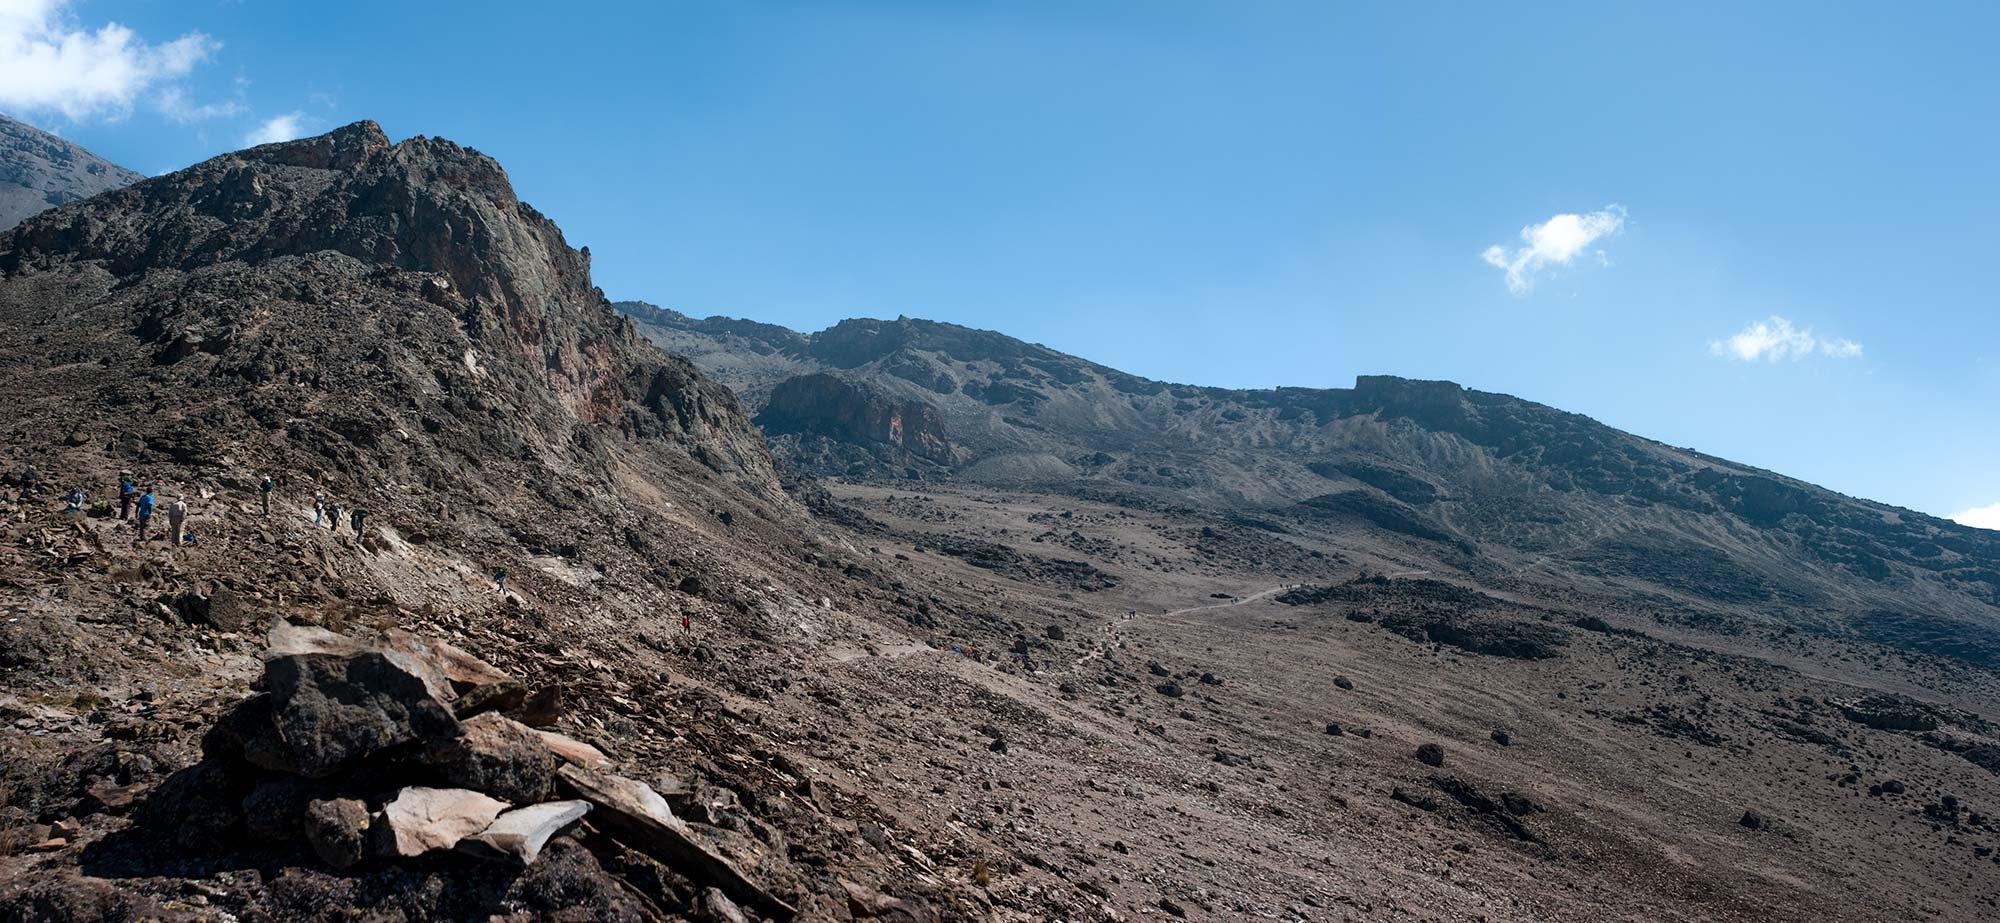 D6-31-camp-in-sight-karanga-to-barufu-camp-kilimanjaro.jpg